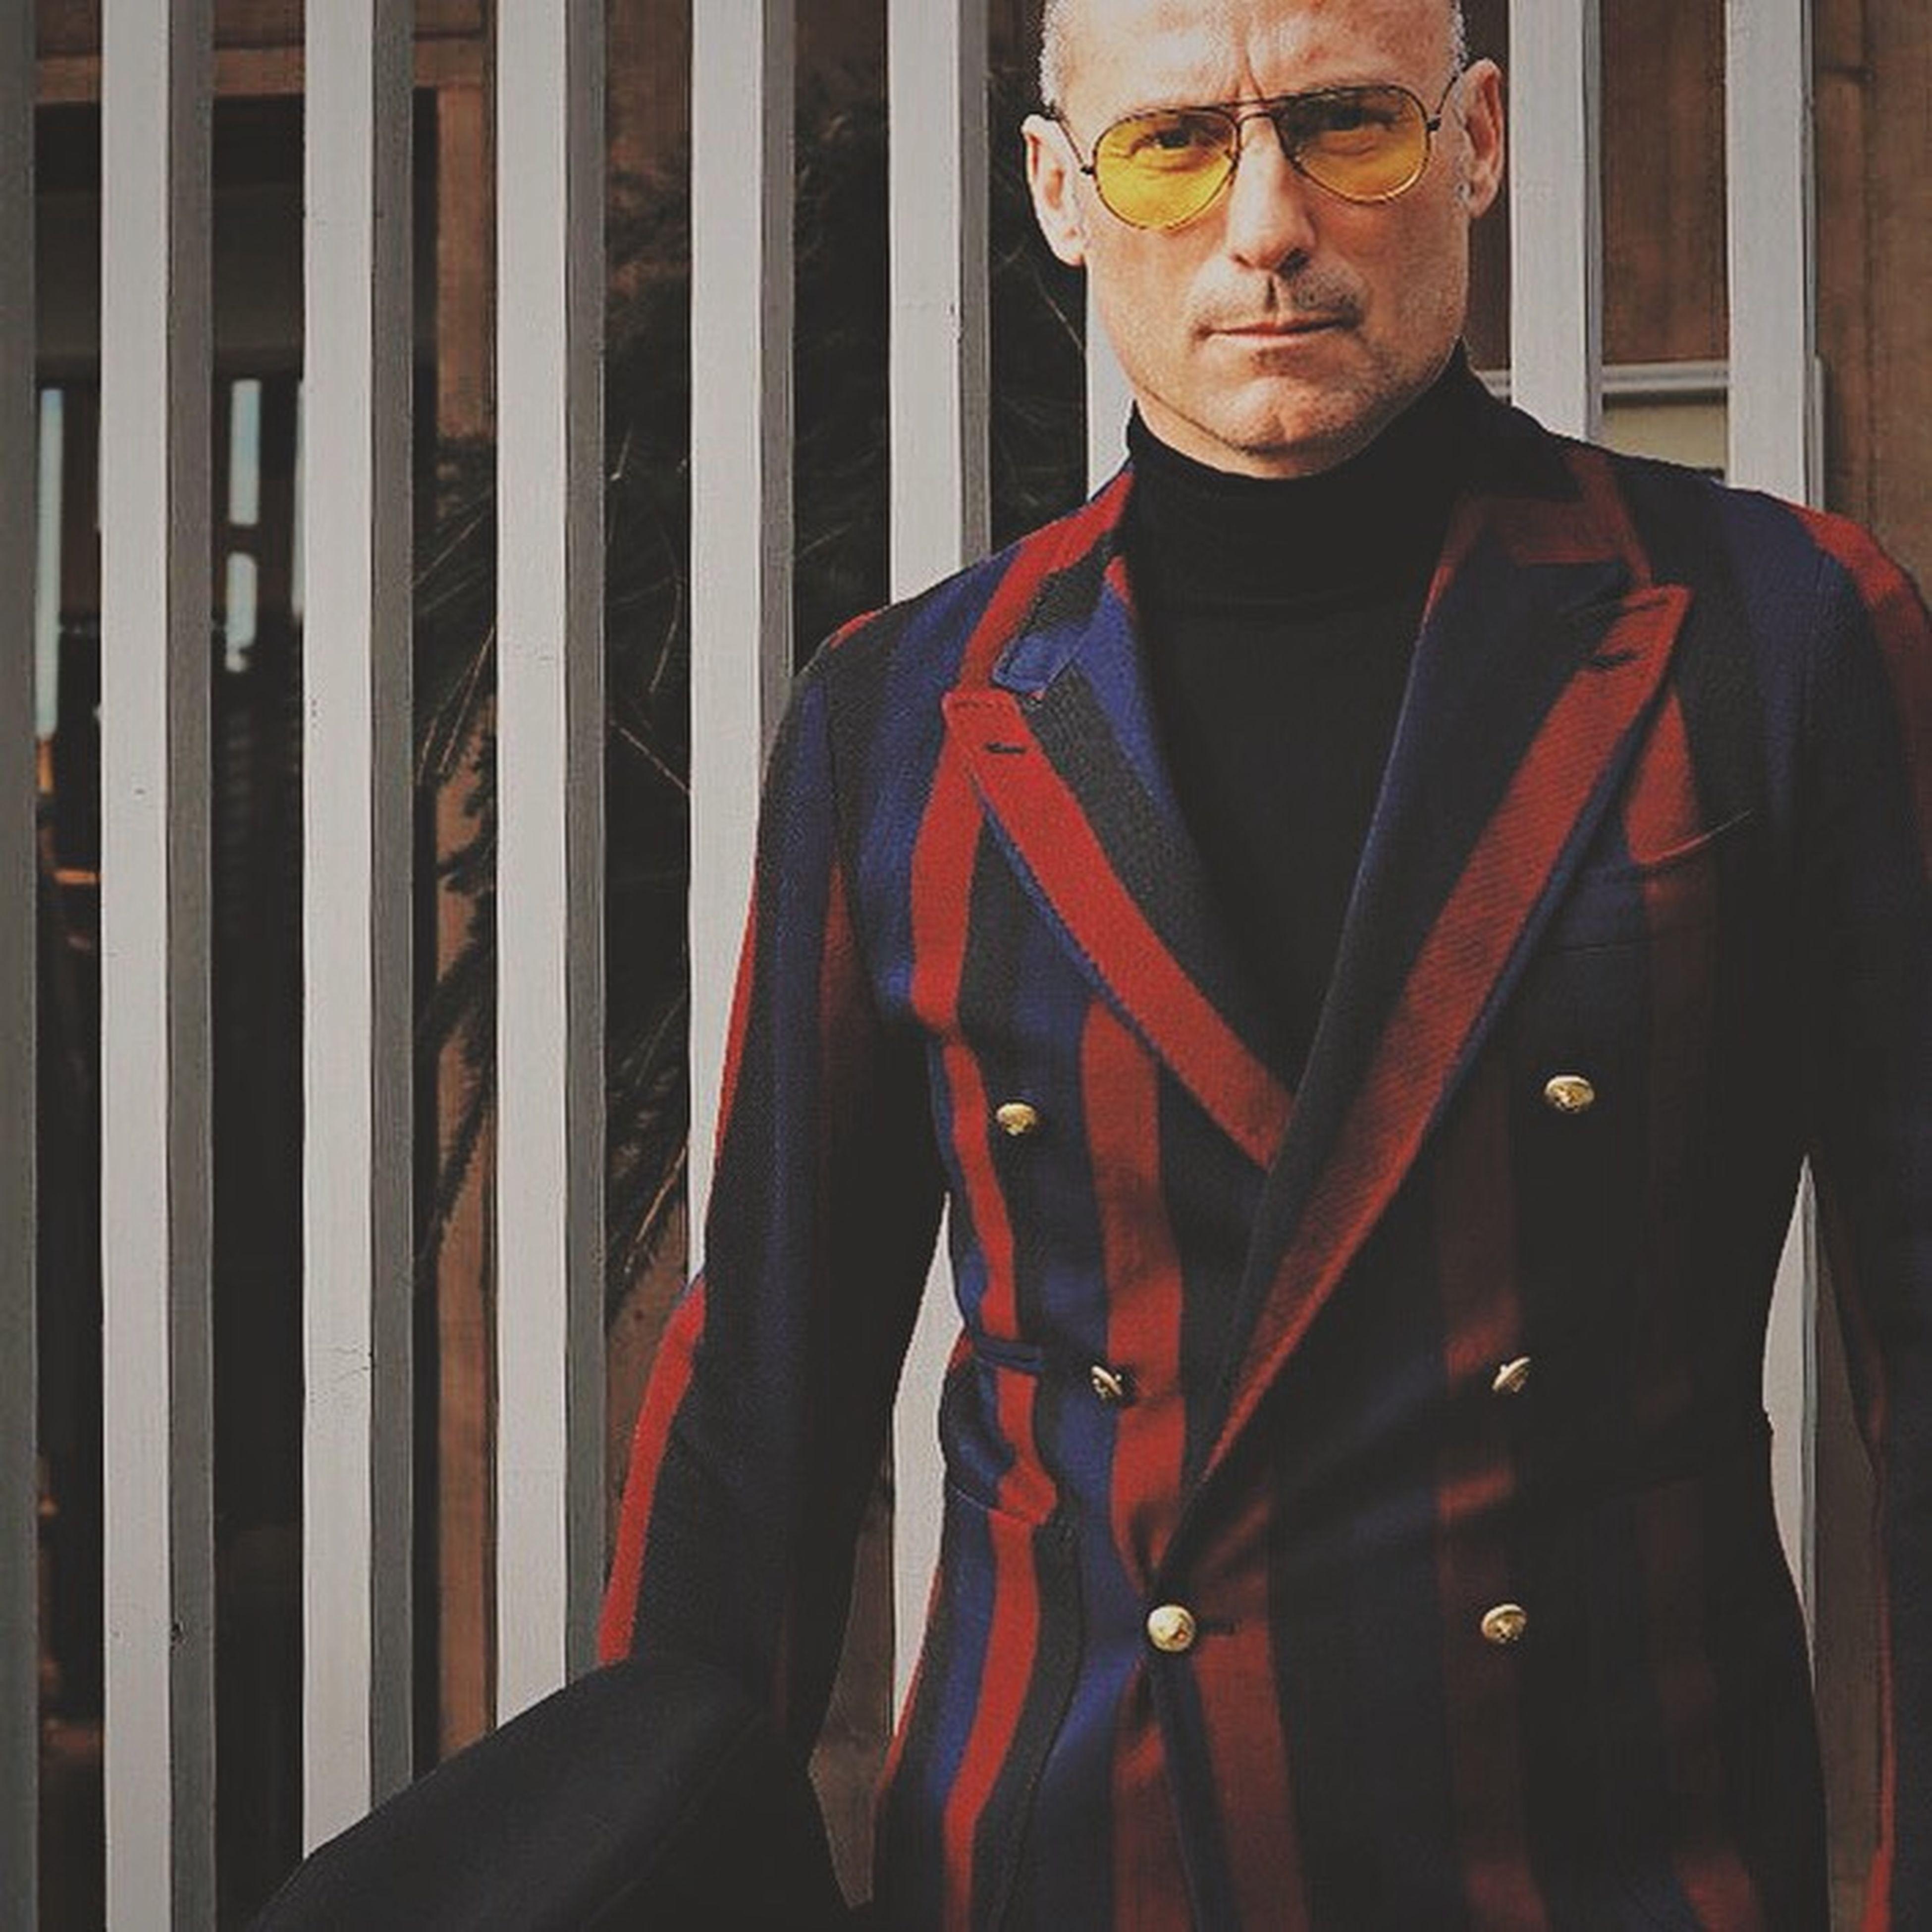 Stripes on stripes Fashion Elegance Everywhere Open Edit EyeEm Best Shots Street Portrait Streetfashion Portrait GoodFellas IMP At Pitti Uomo 87